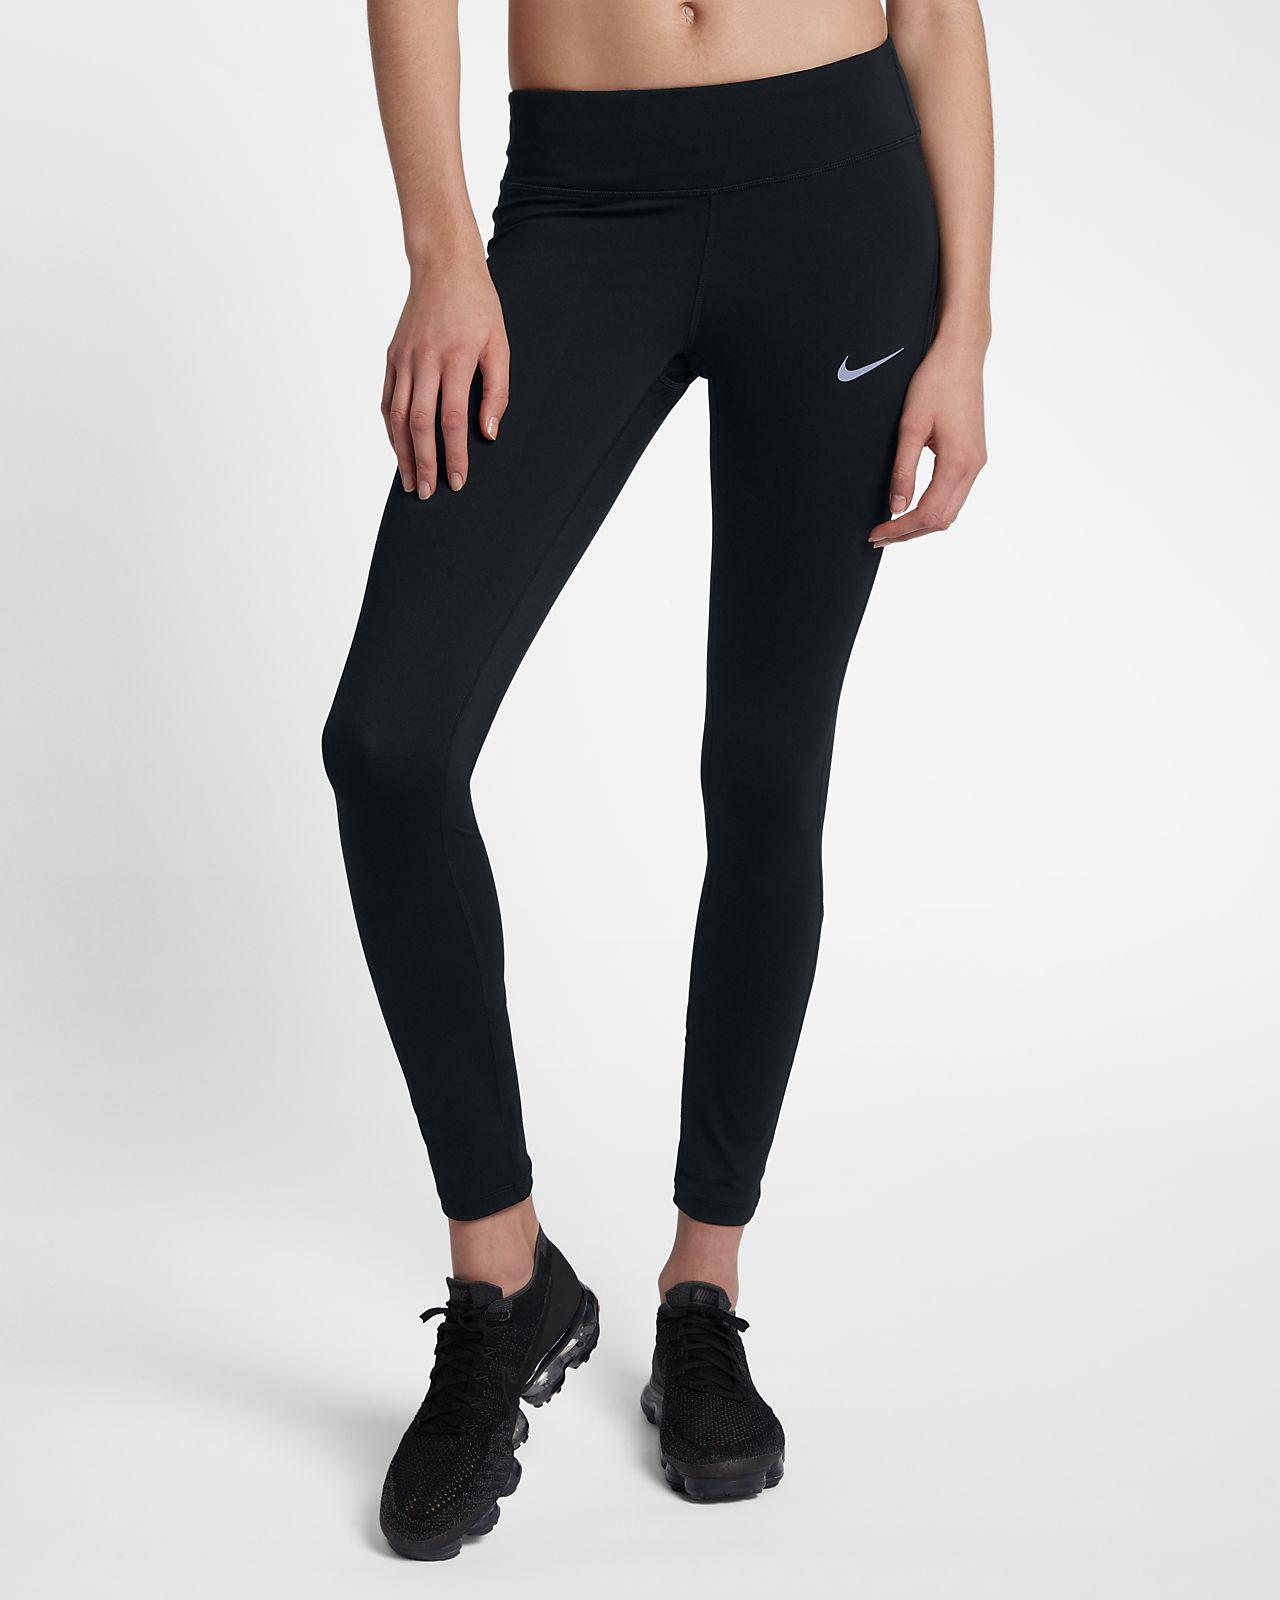 Running nike tights